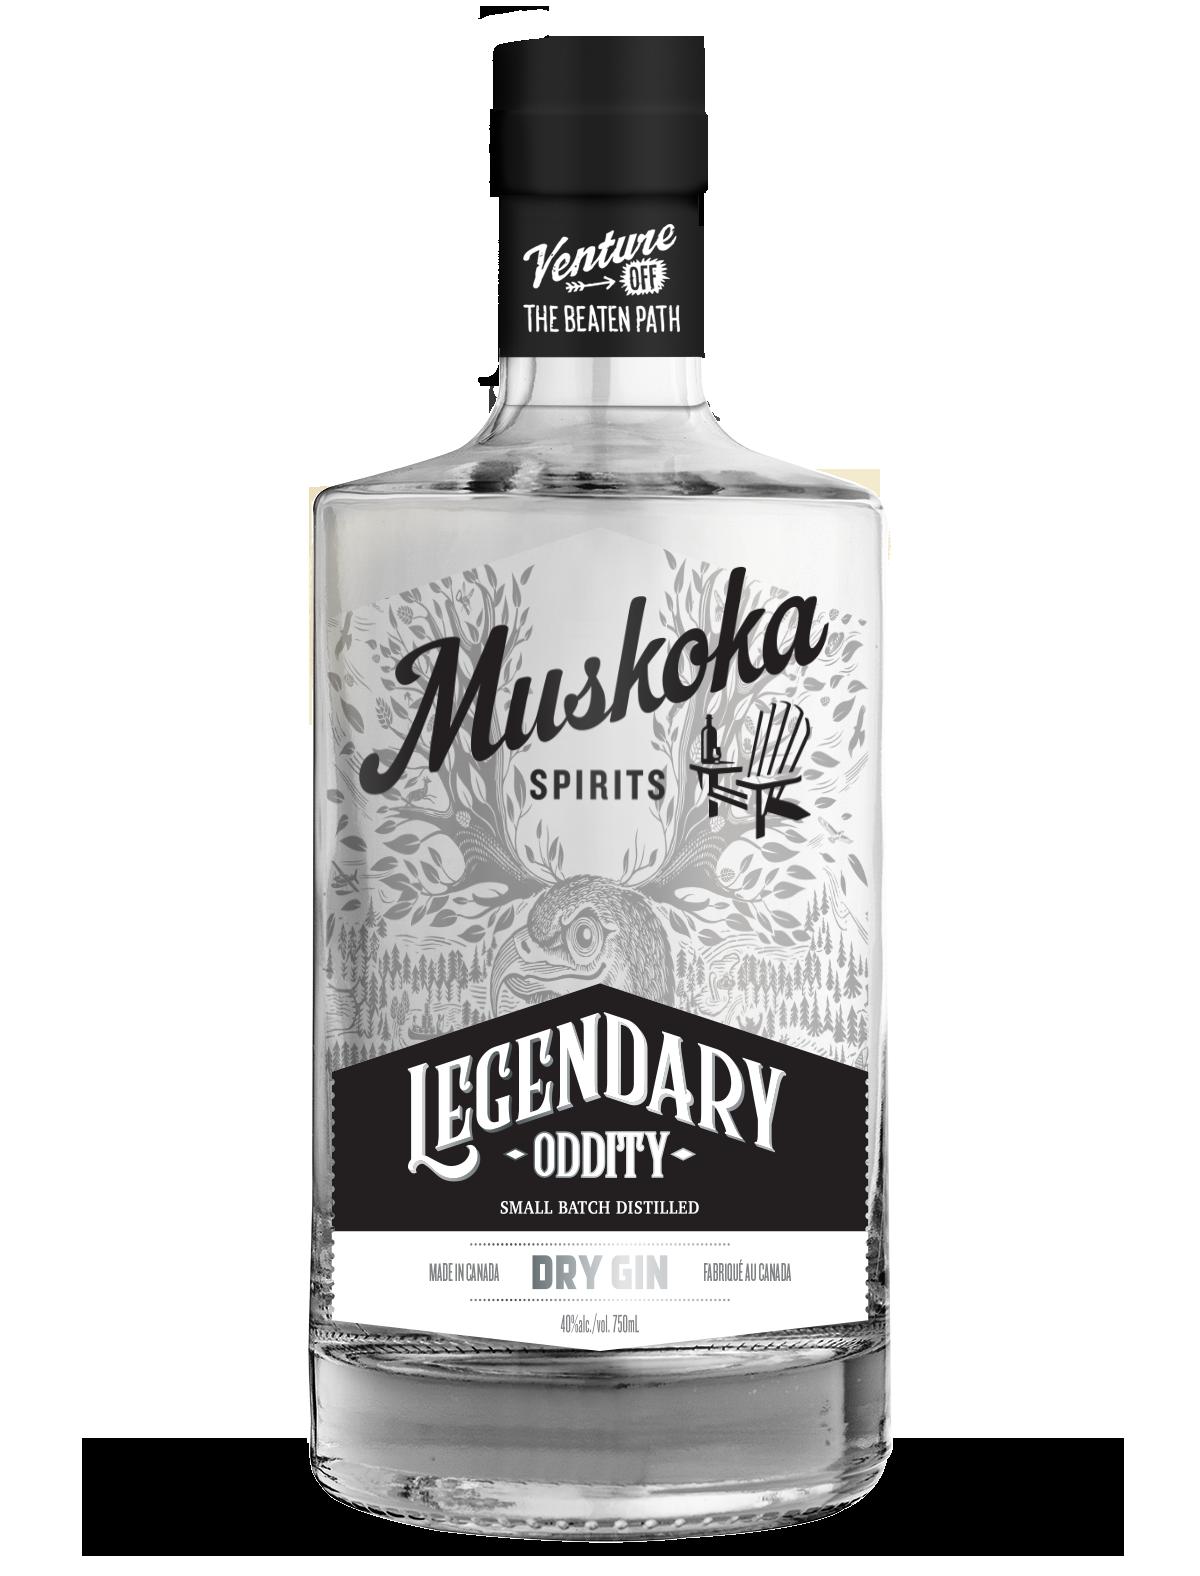 Legendary Oddity Gin